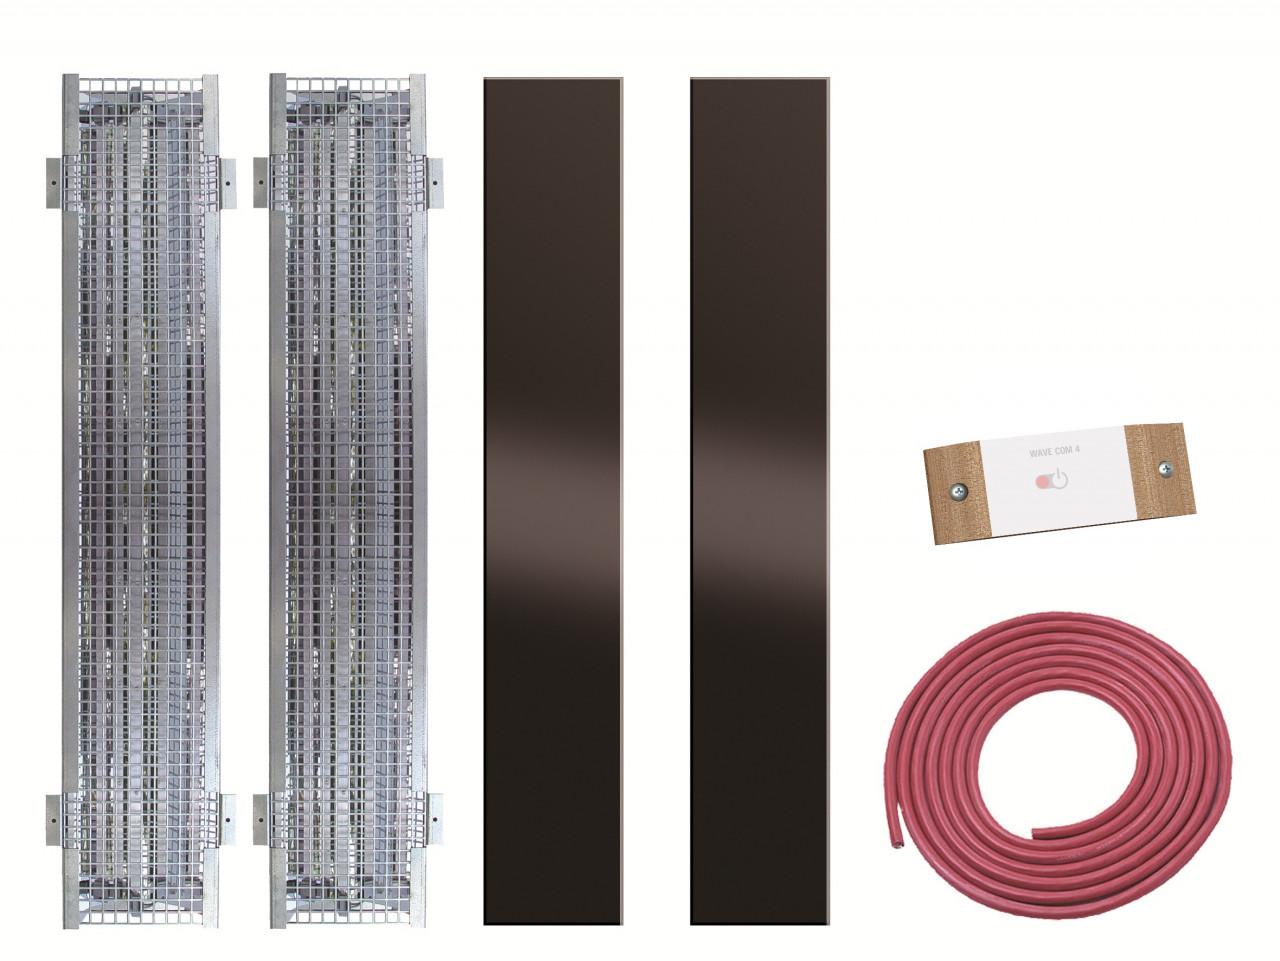 Saunacabine IR-techniek pakket: 2 x Philips Vitae 750W + sturing